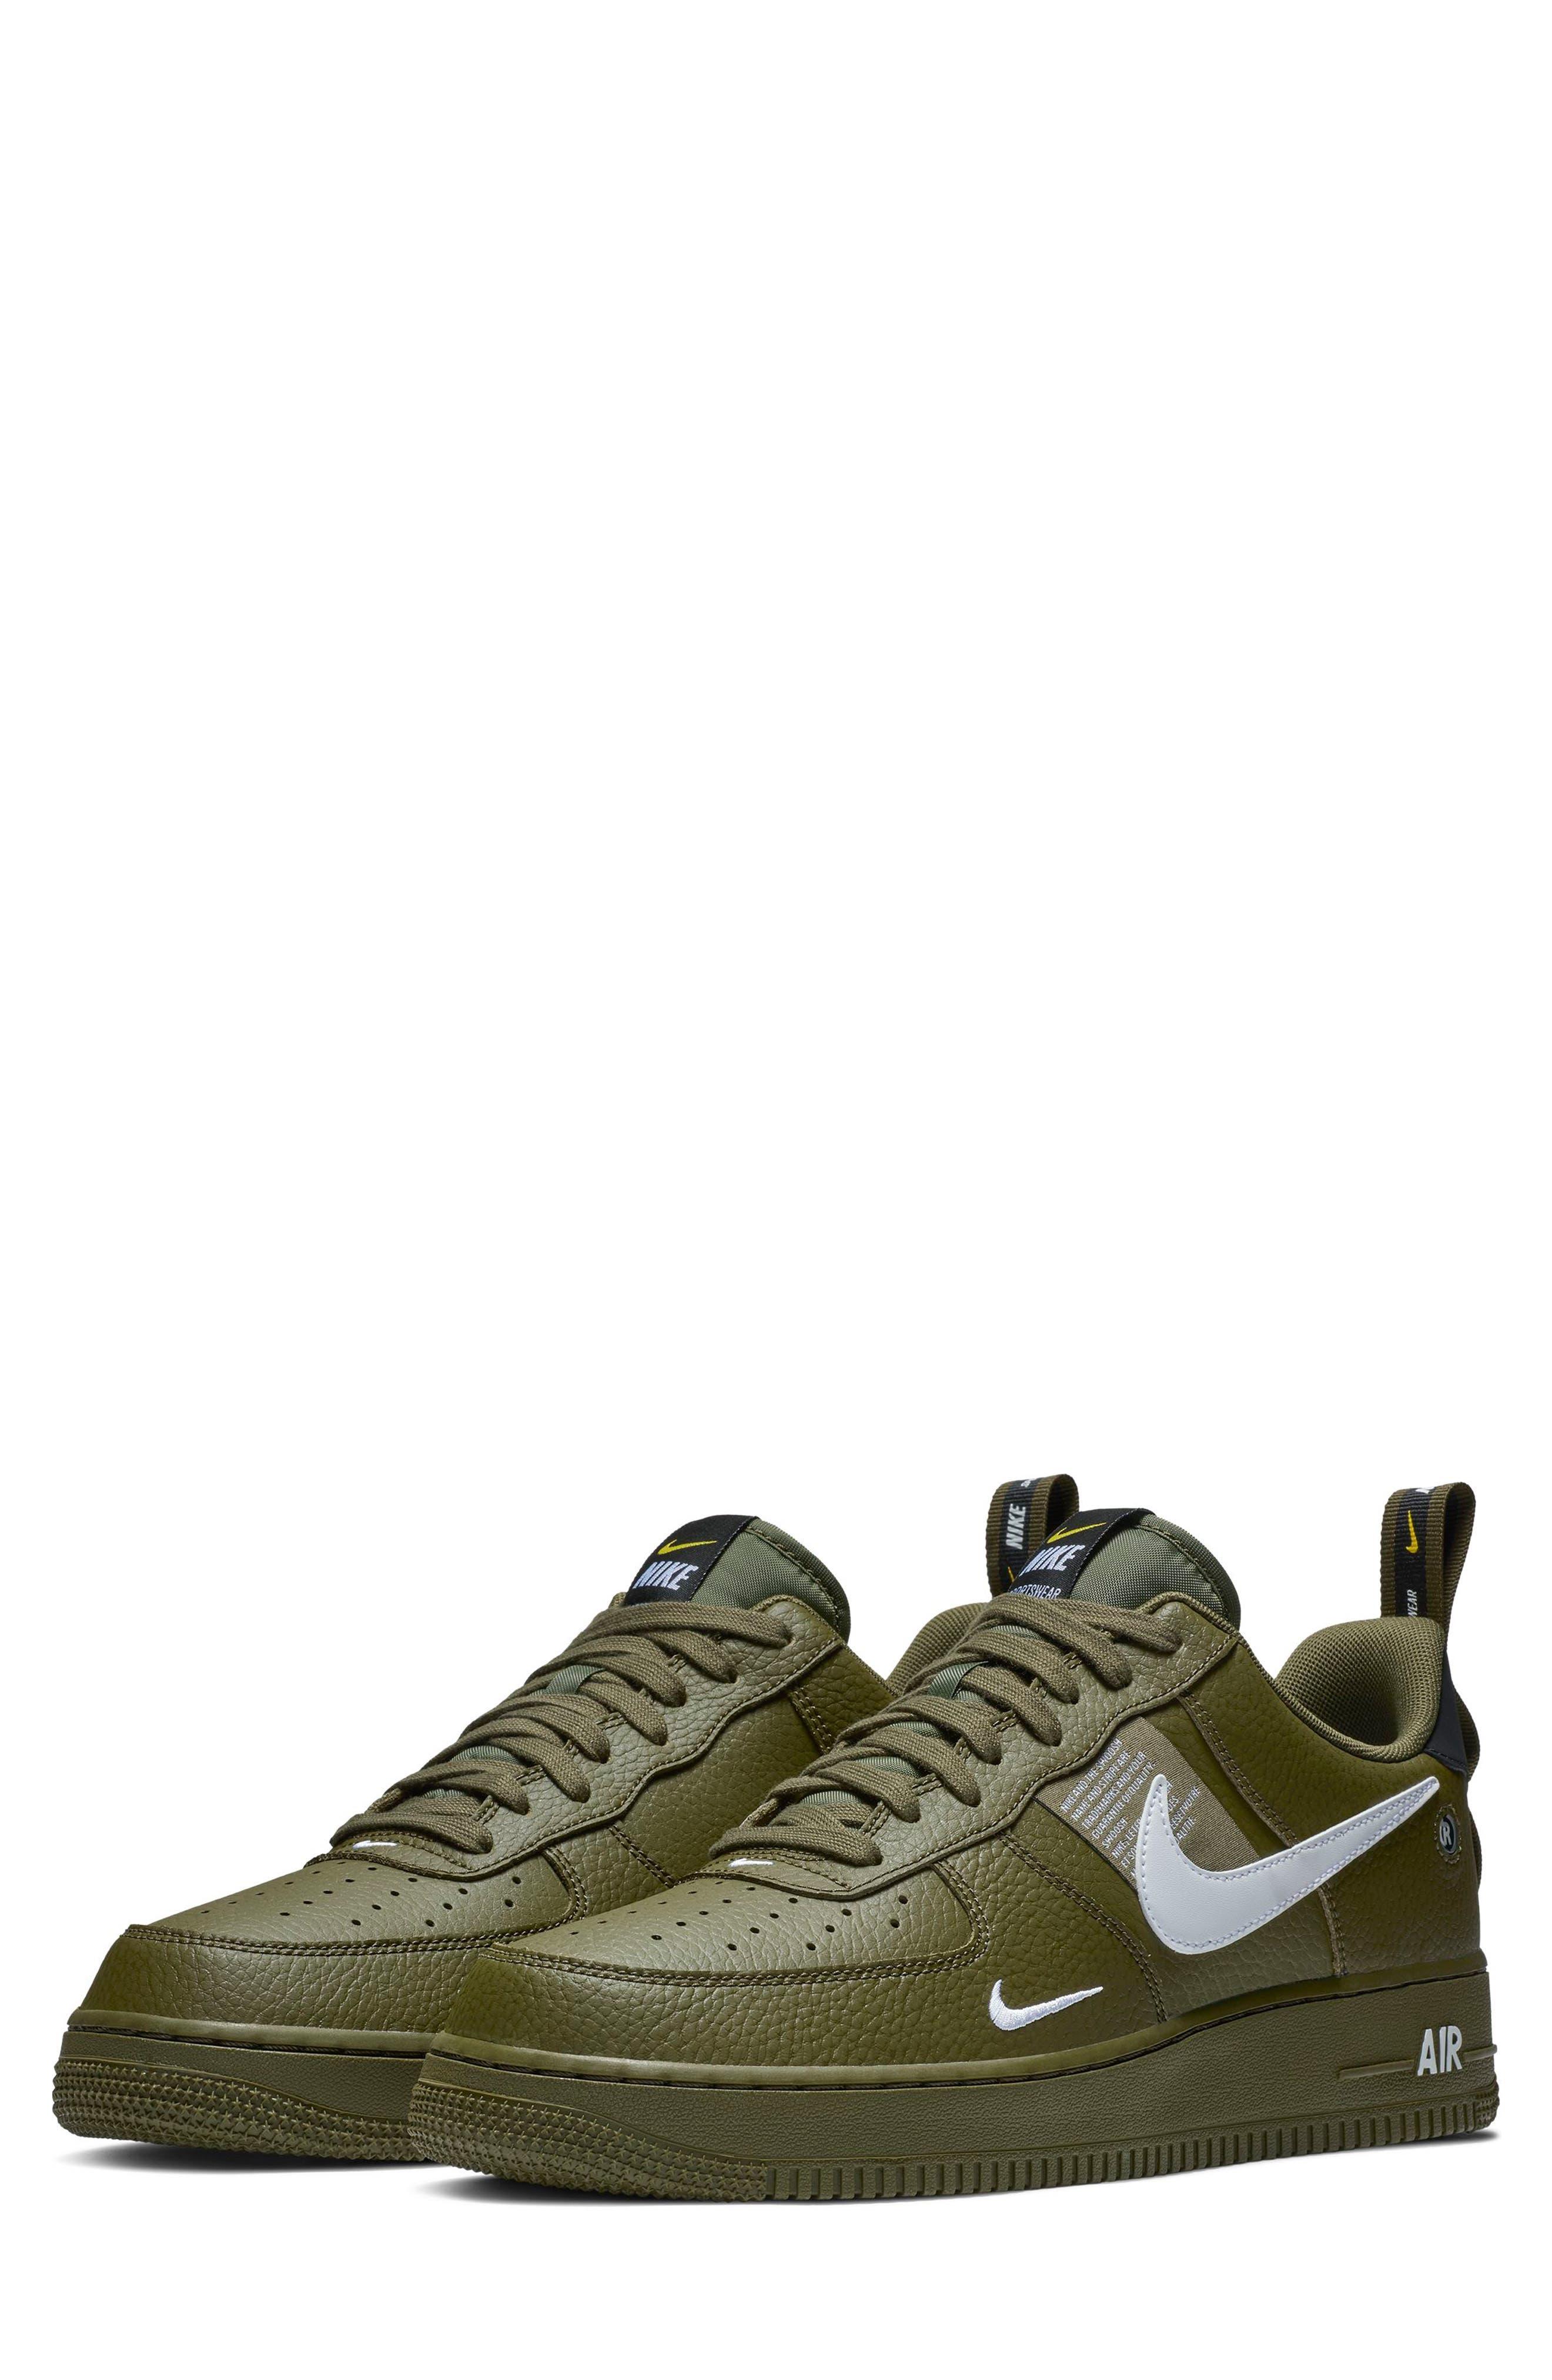 Air Force 1 '07 LV8 Utility Sneaker,                             Main thumbnail 1, color,                             300